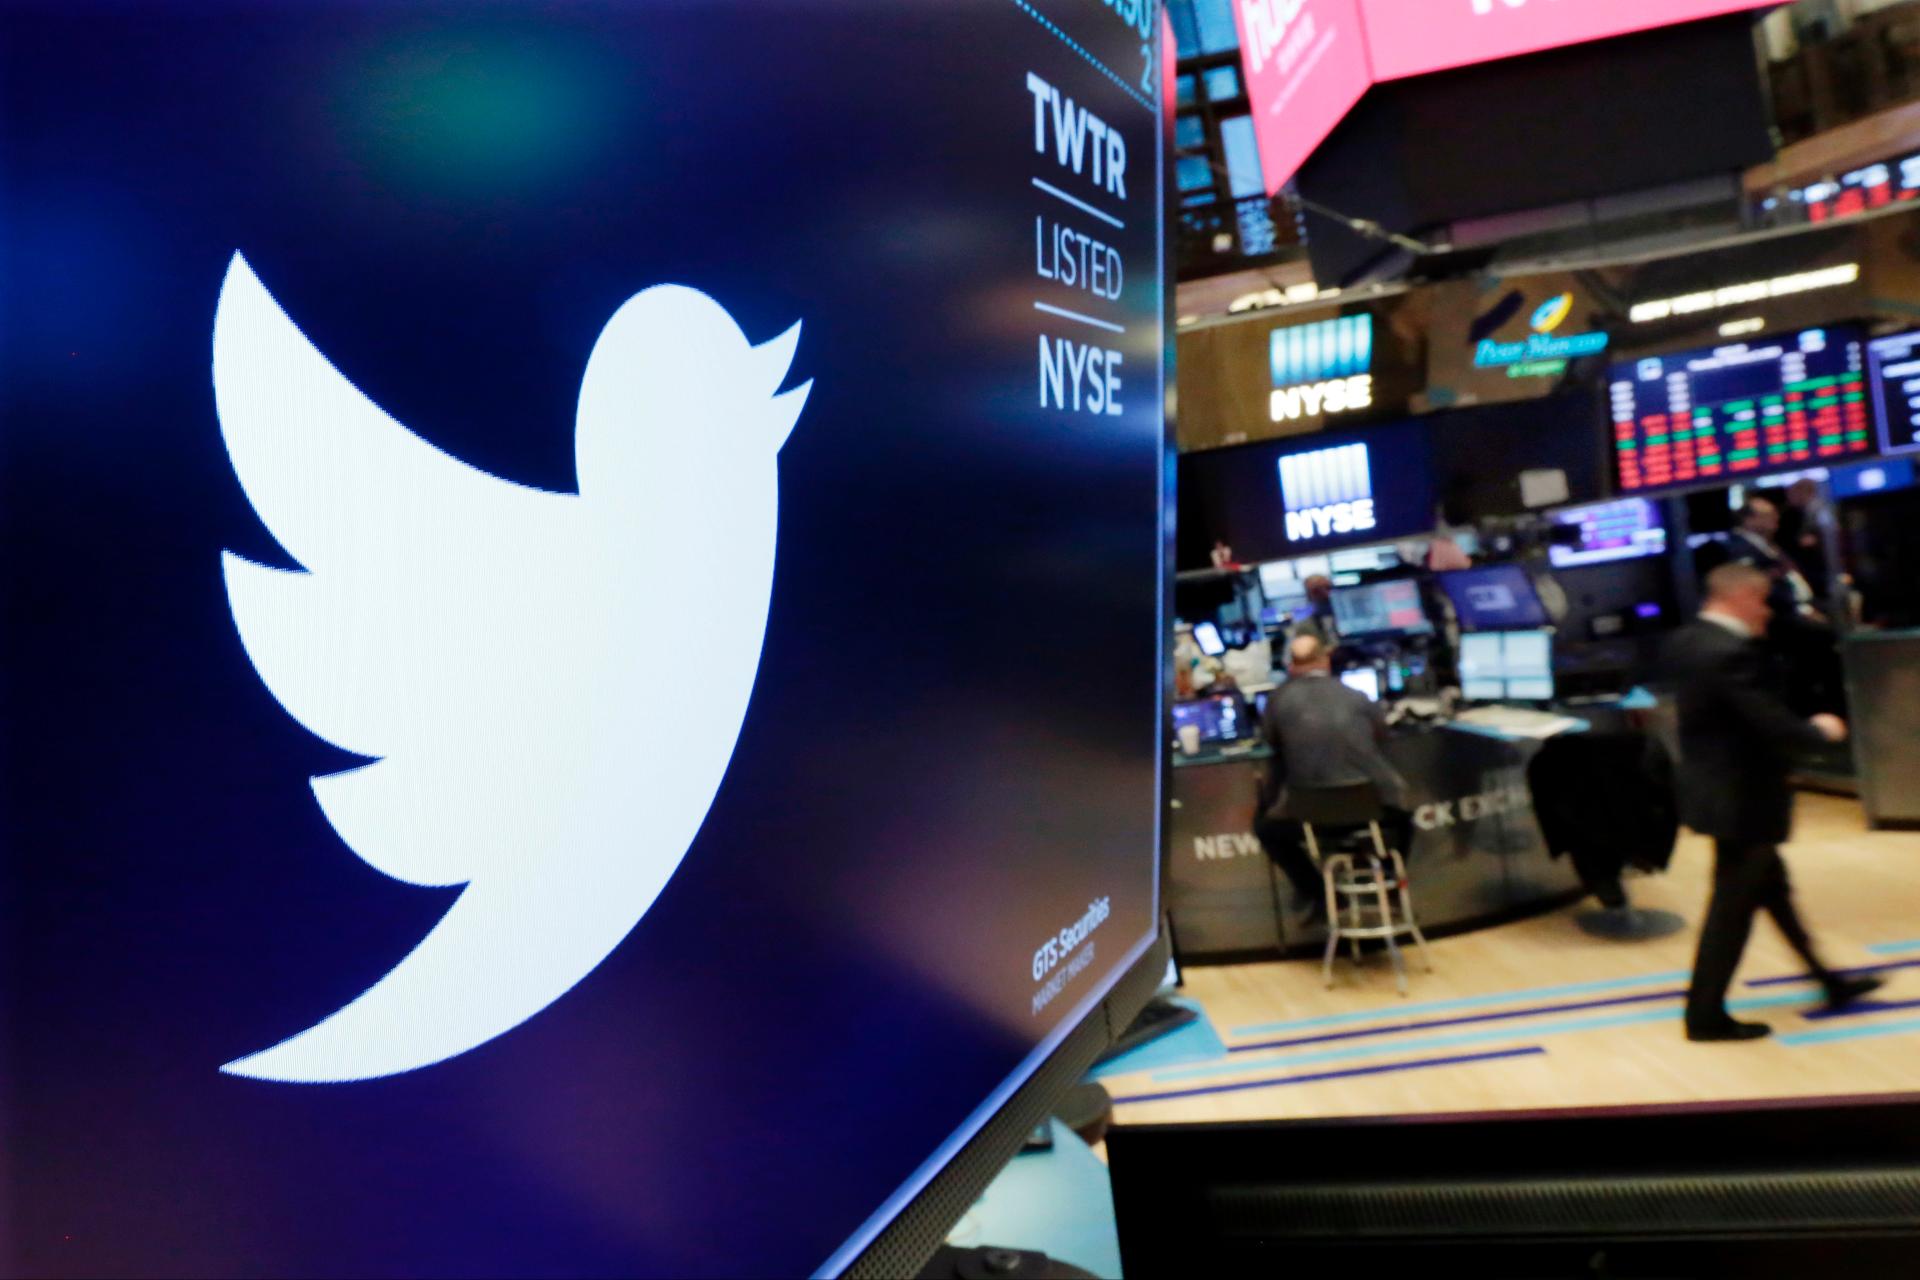 Twitter Accidentally Shared User Data with Advertising Partner